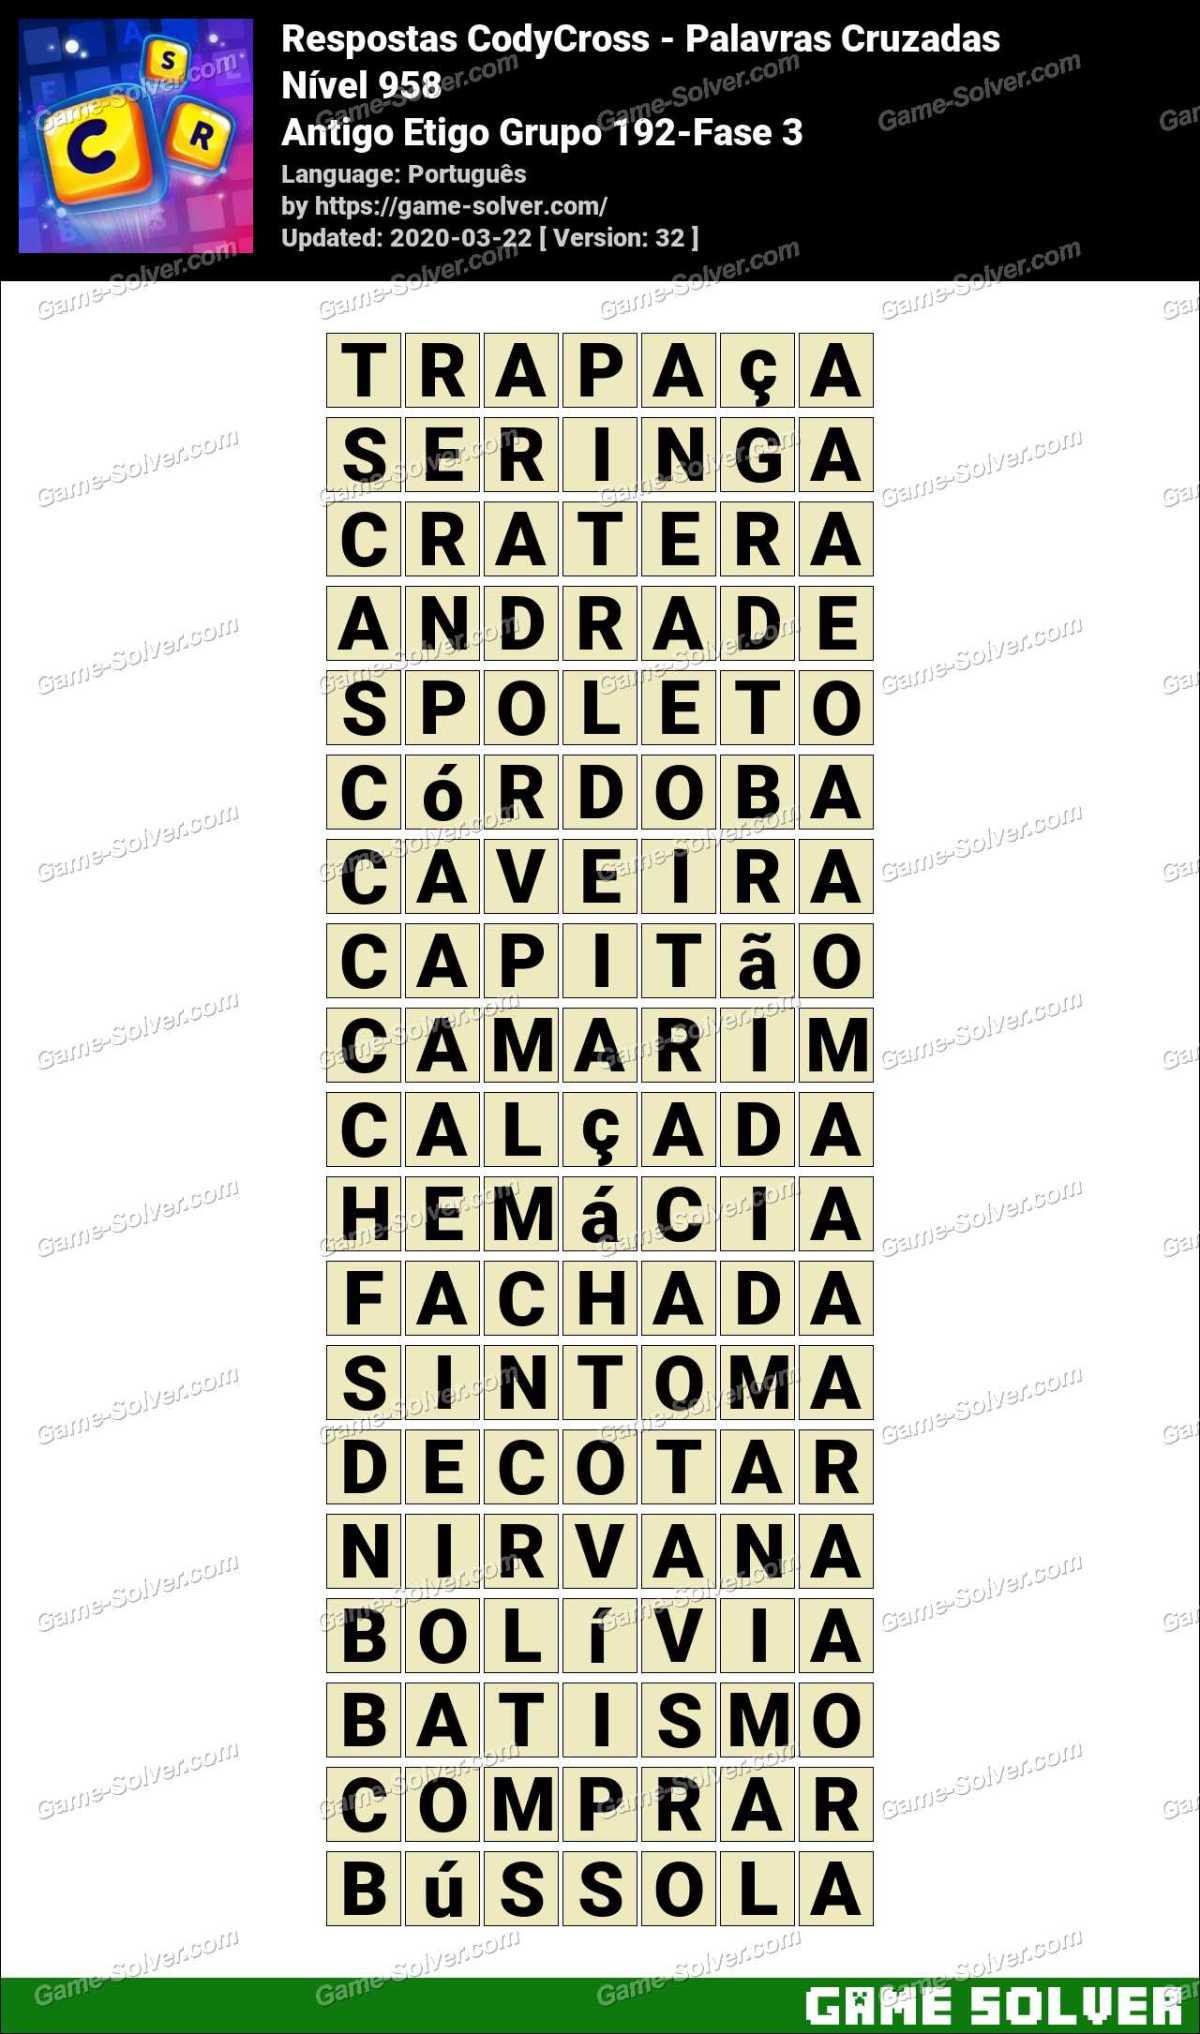 Respostas CodyCross Antigo Etigo Grupo 192-Fase 3